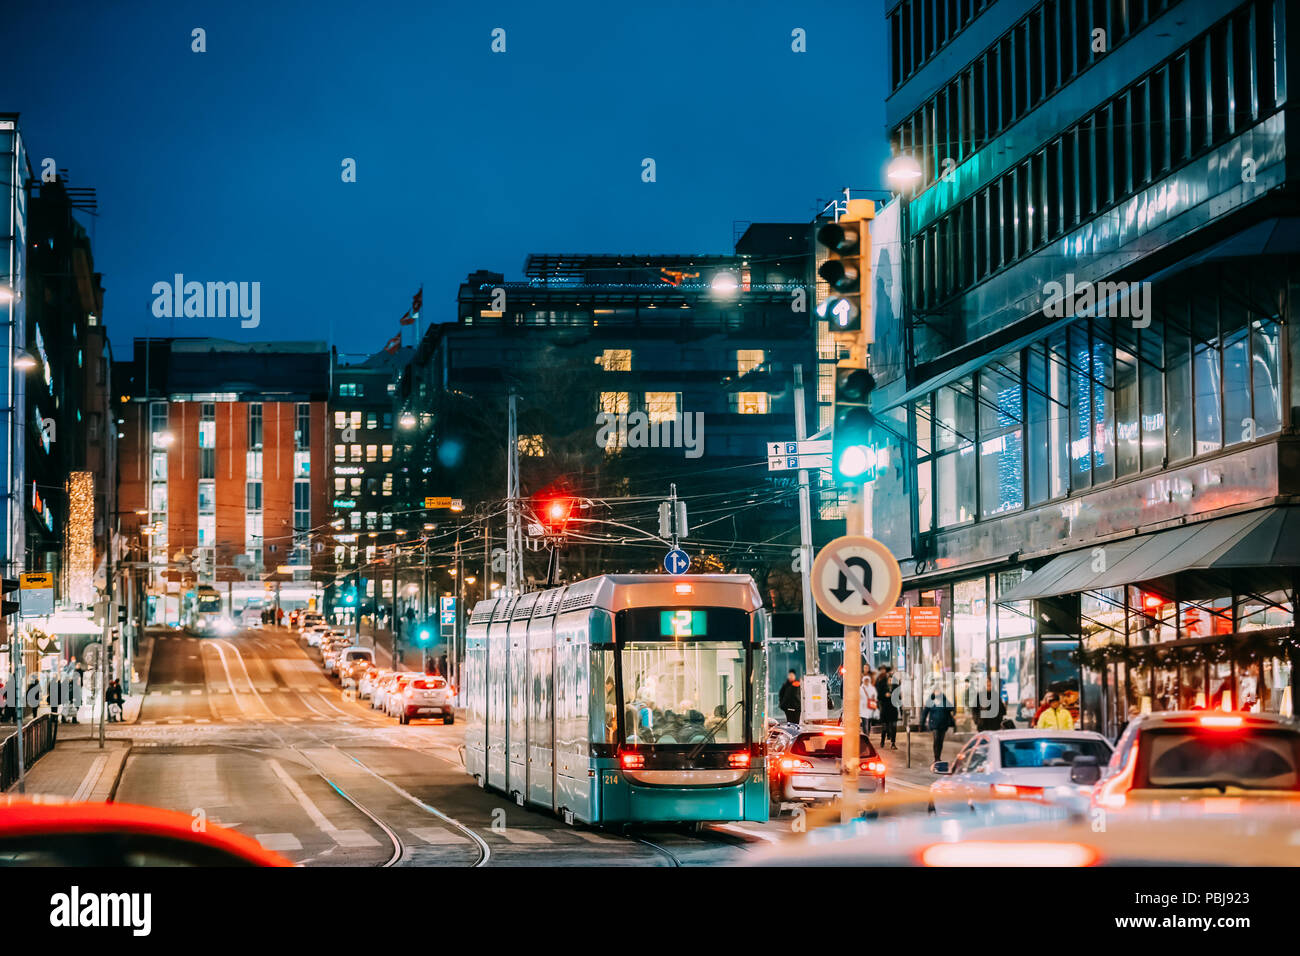 Helsinki, Finland. Tram Departs From A Stop On Kaivokatu Street In Helsinki. Night View Of Kaivokatu Street In Kluuvi District In Evening Or Night Ill - Stock Image